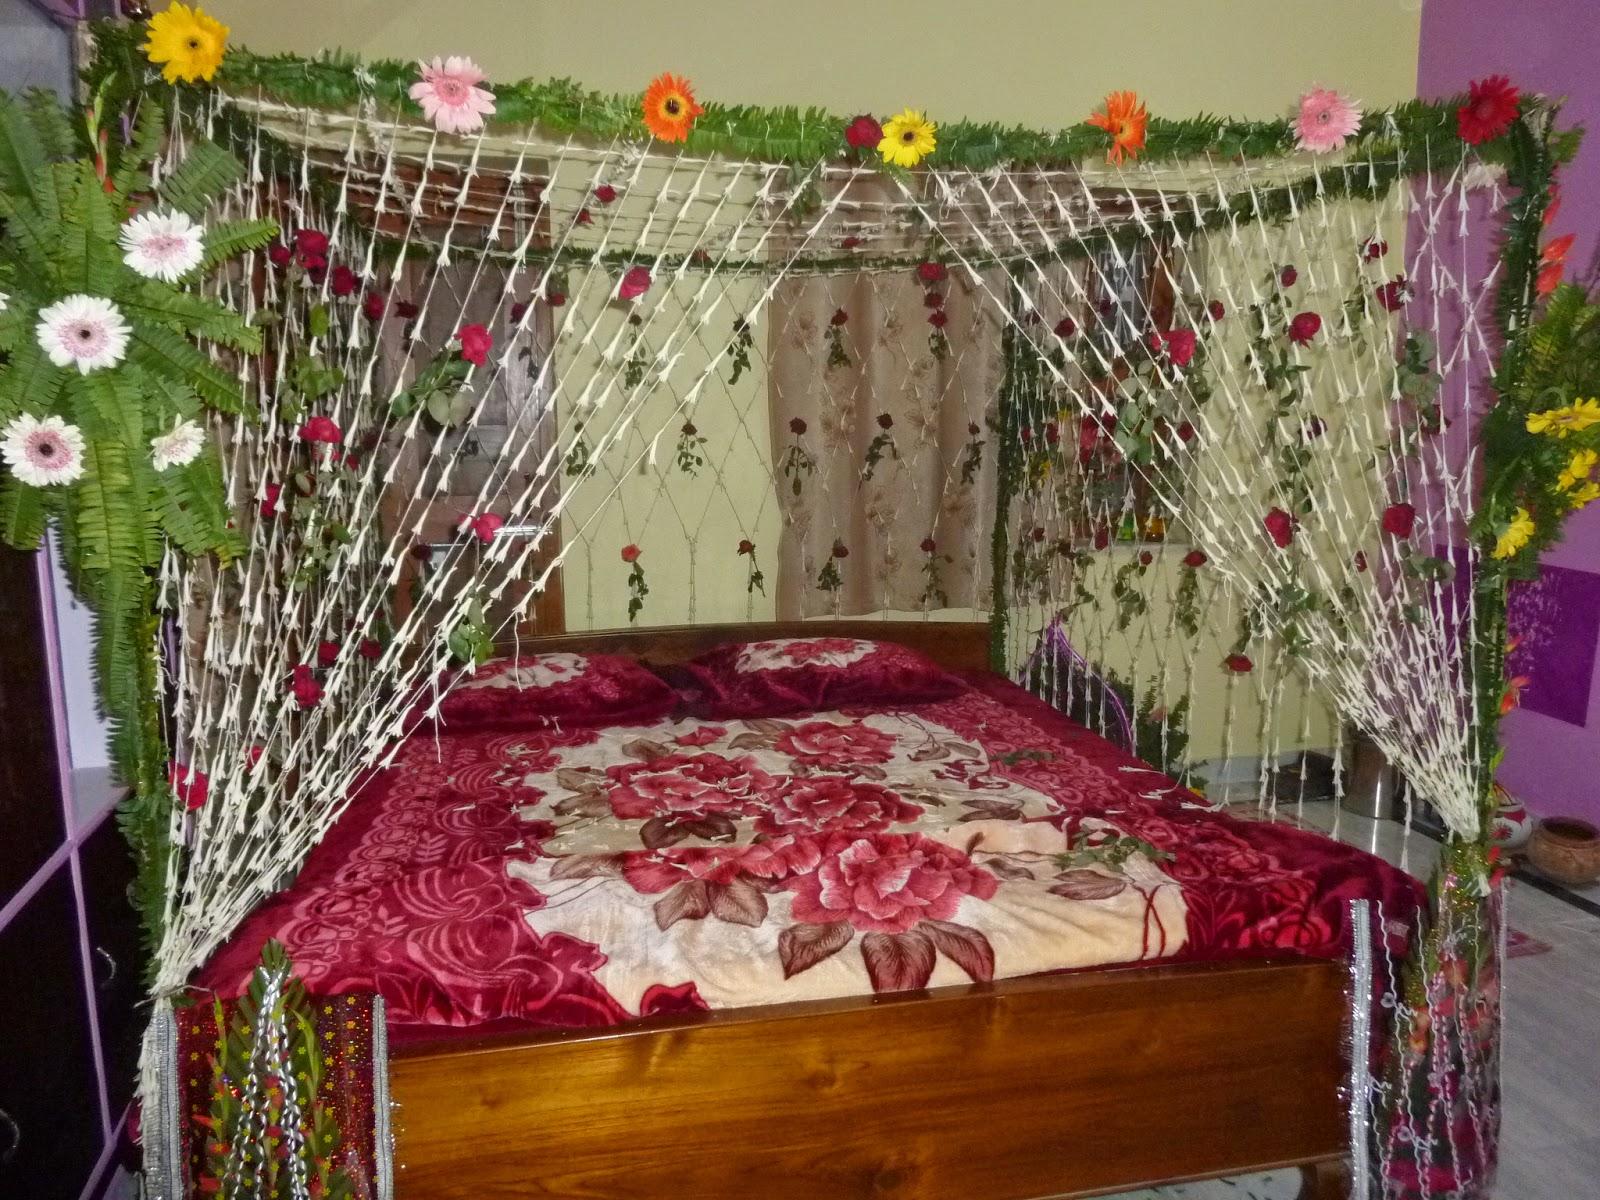 Bedroom decorating ideas for wedding night - Wedding Bedroom Decorations Cukjatidesign